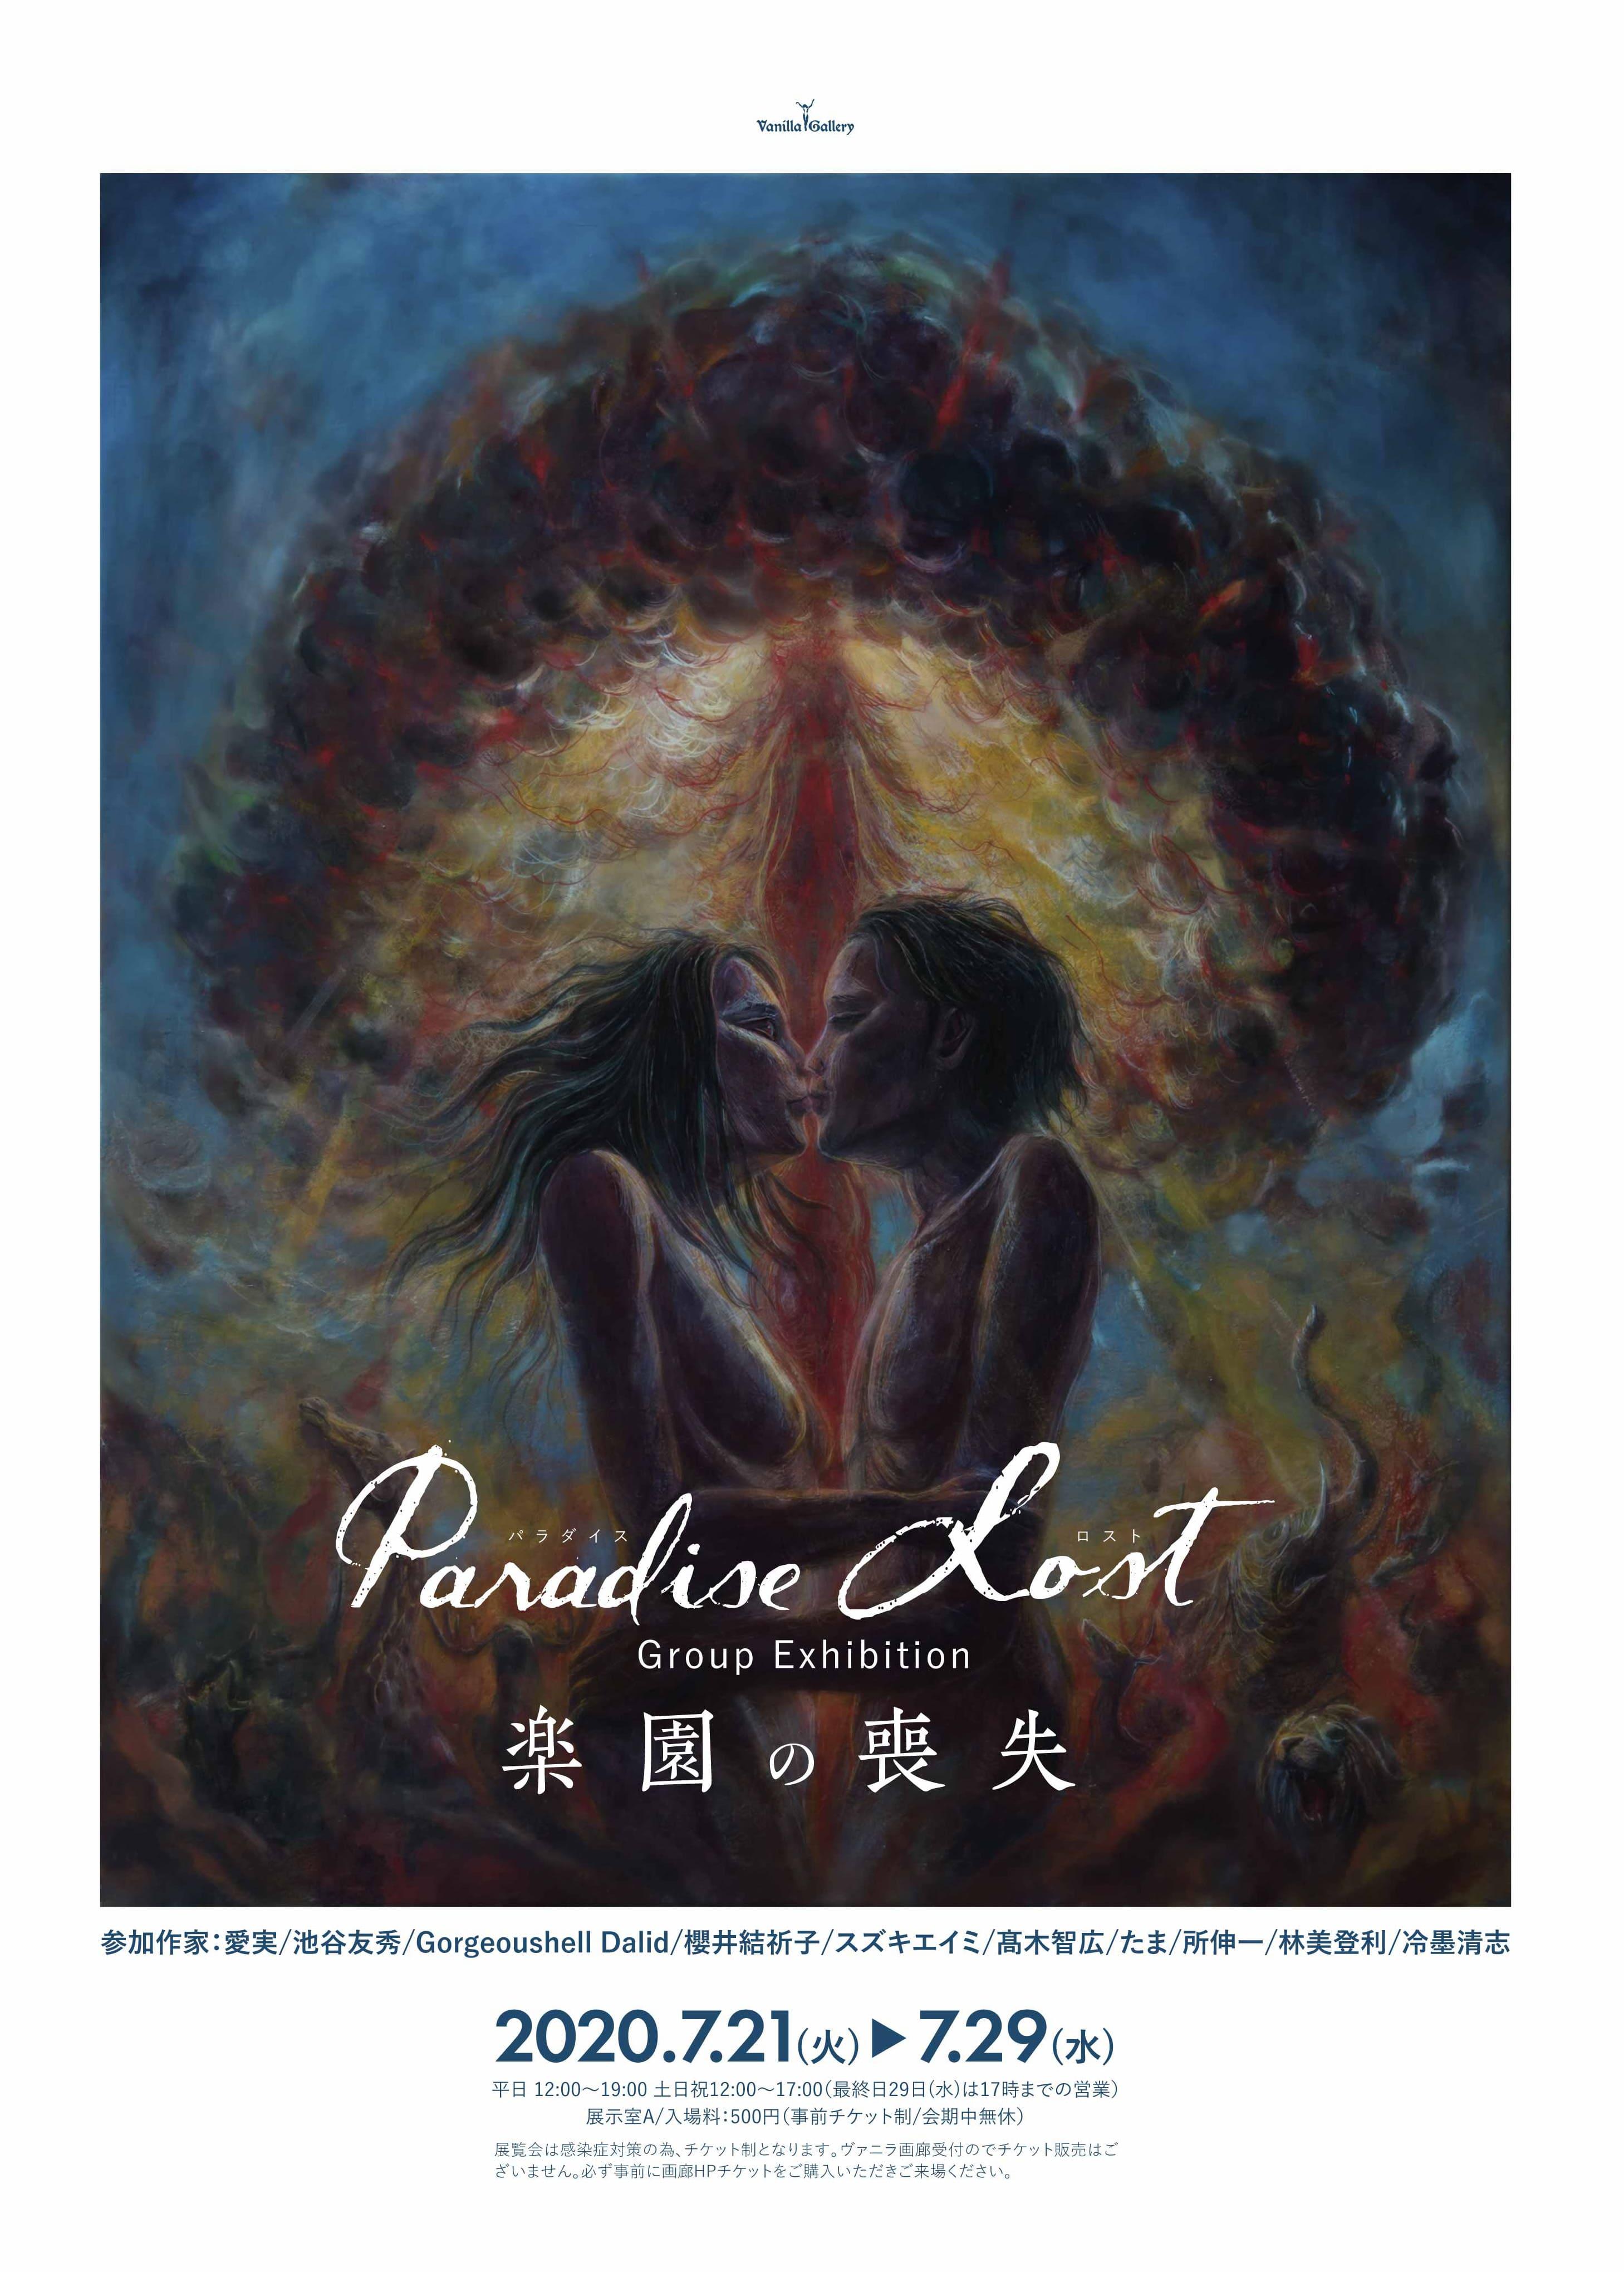 「Paradise Lost ~楽園の喪失~」グループ展 7月23日チケット